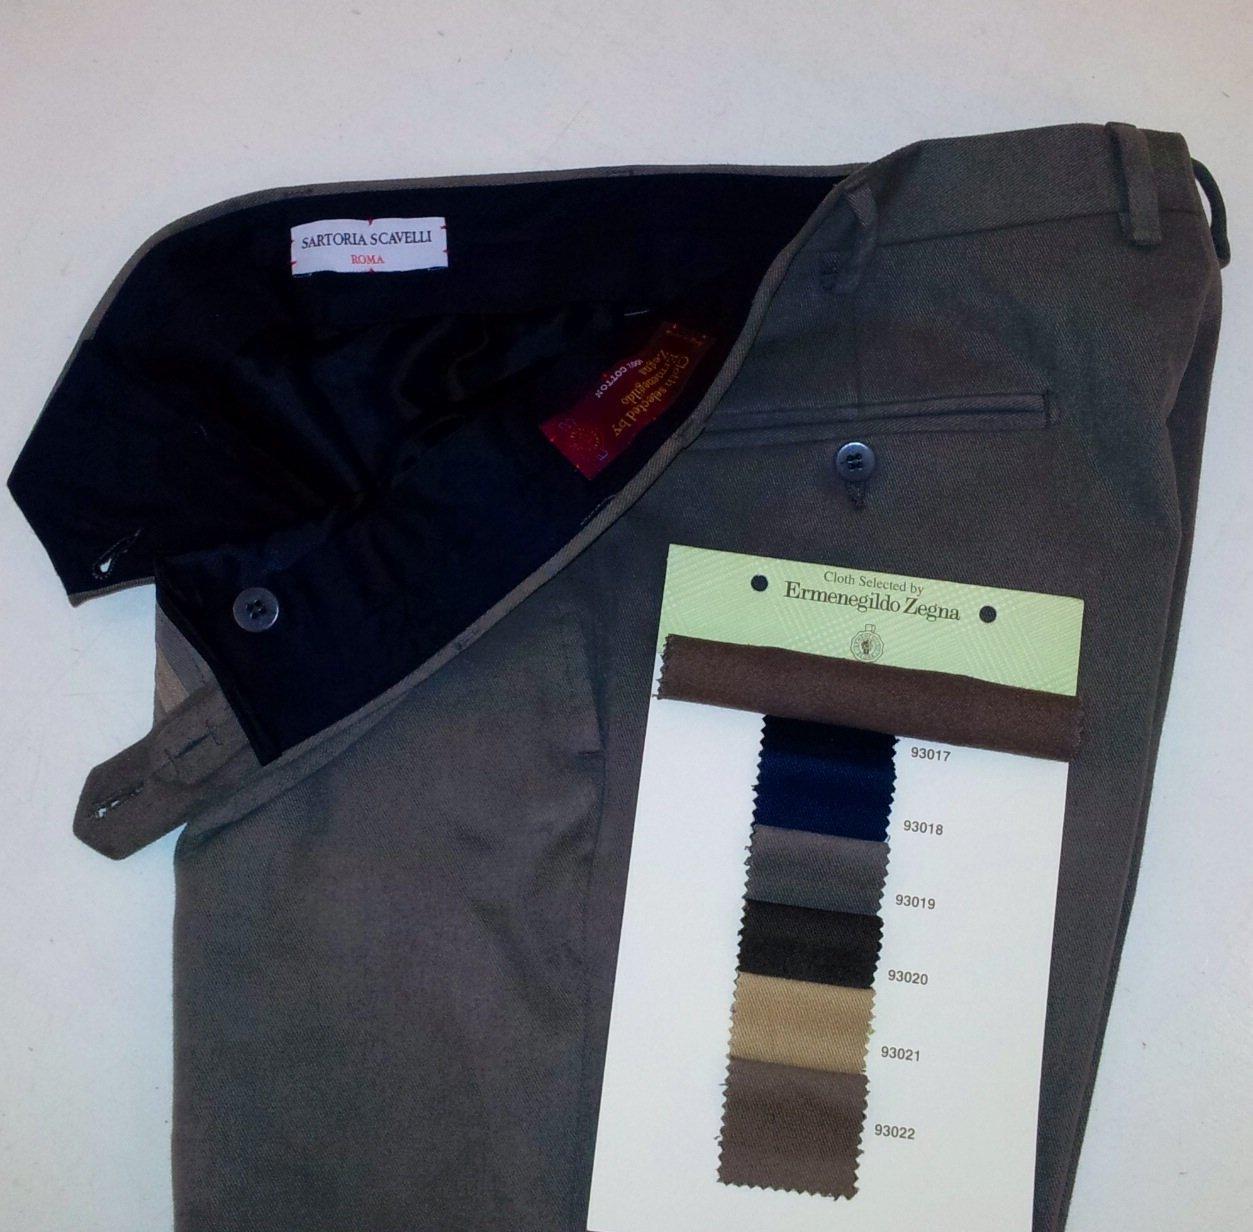 Pantaloni su misura ~ Sartoria Scavelli Roma